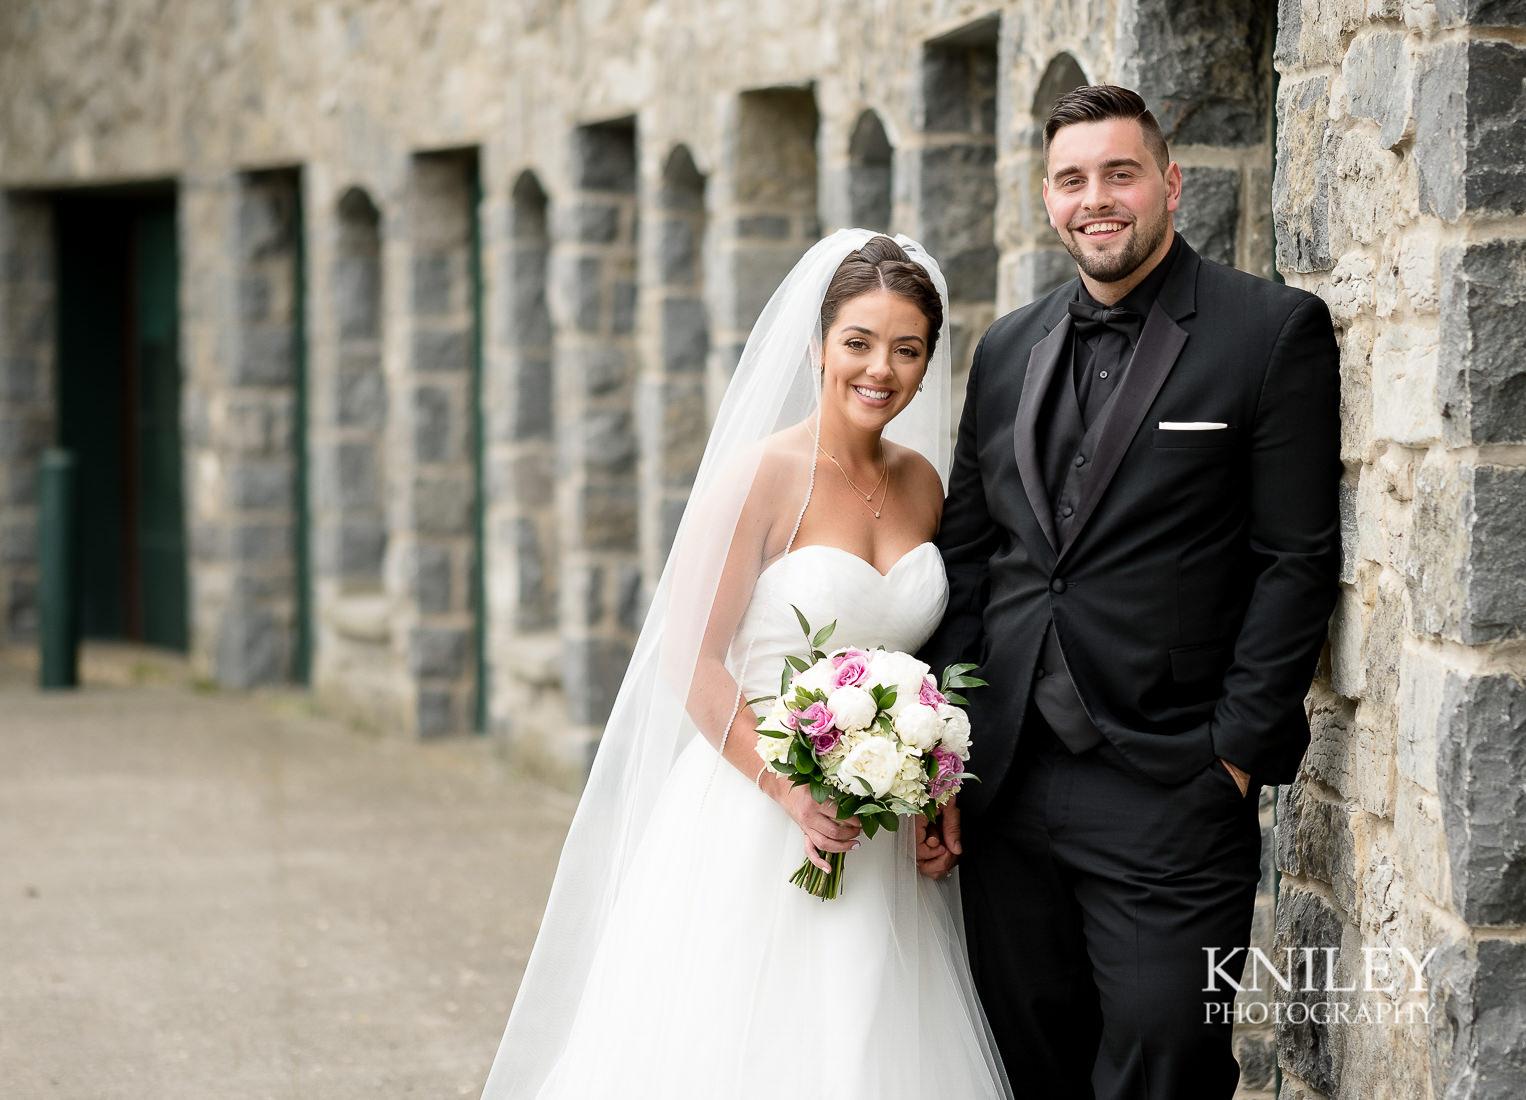 042 - Hoyt Lake Buffalo NY Wedding Pictures -XT2A7652.jpg